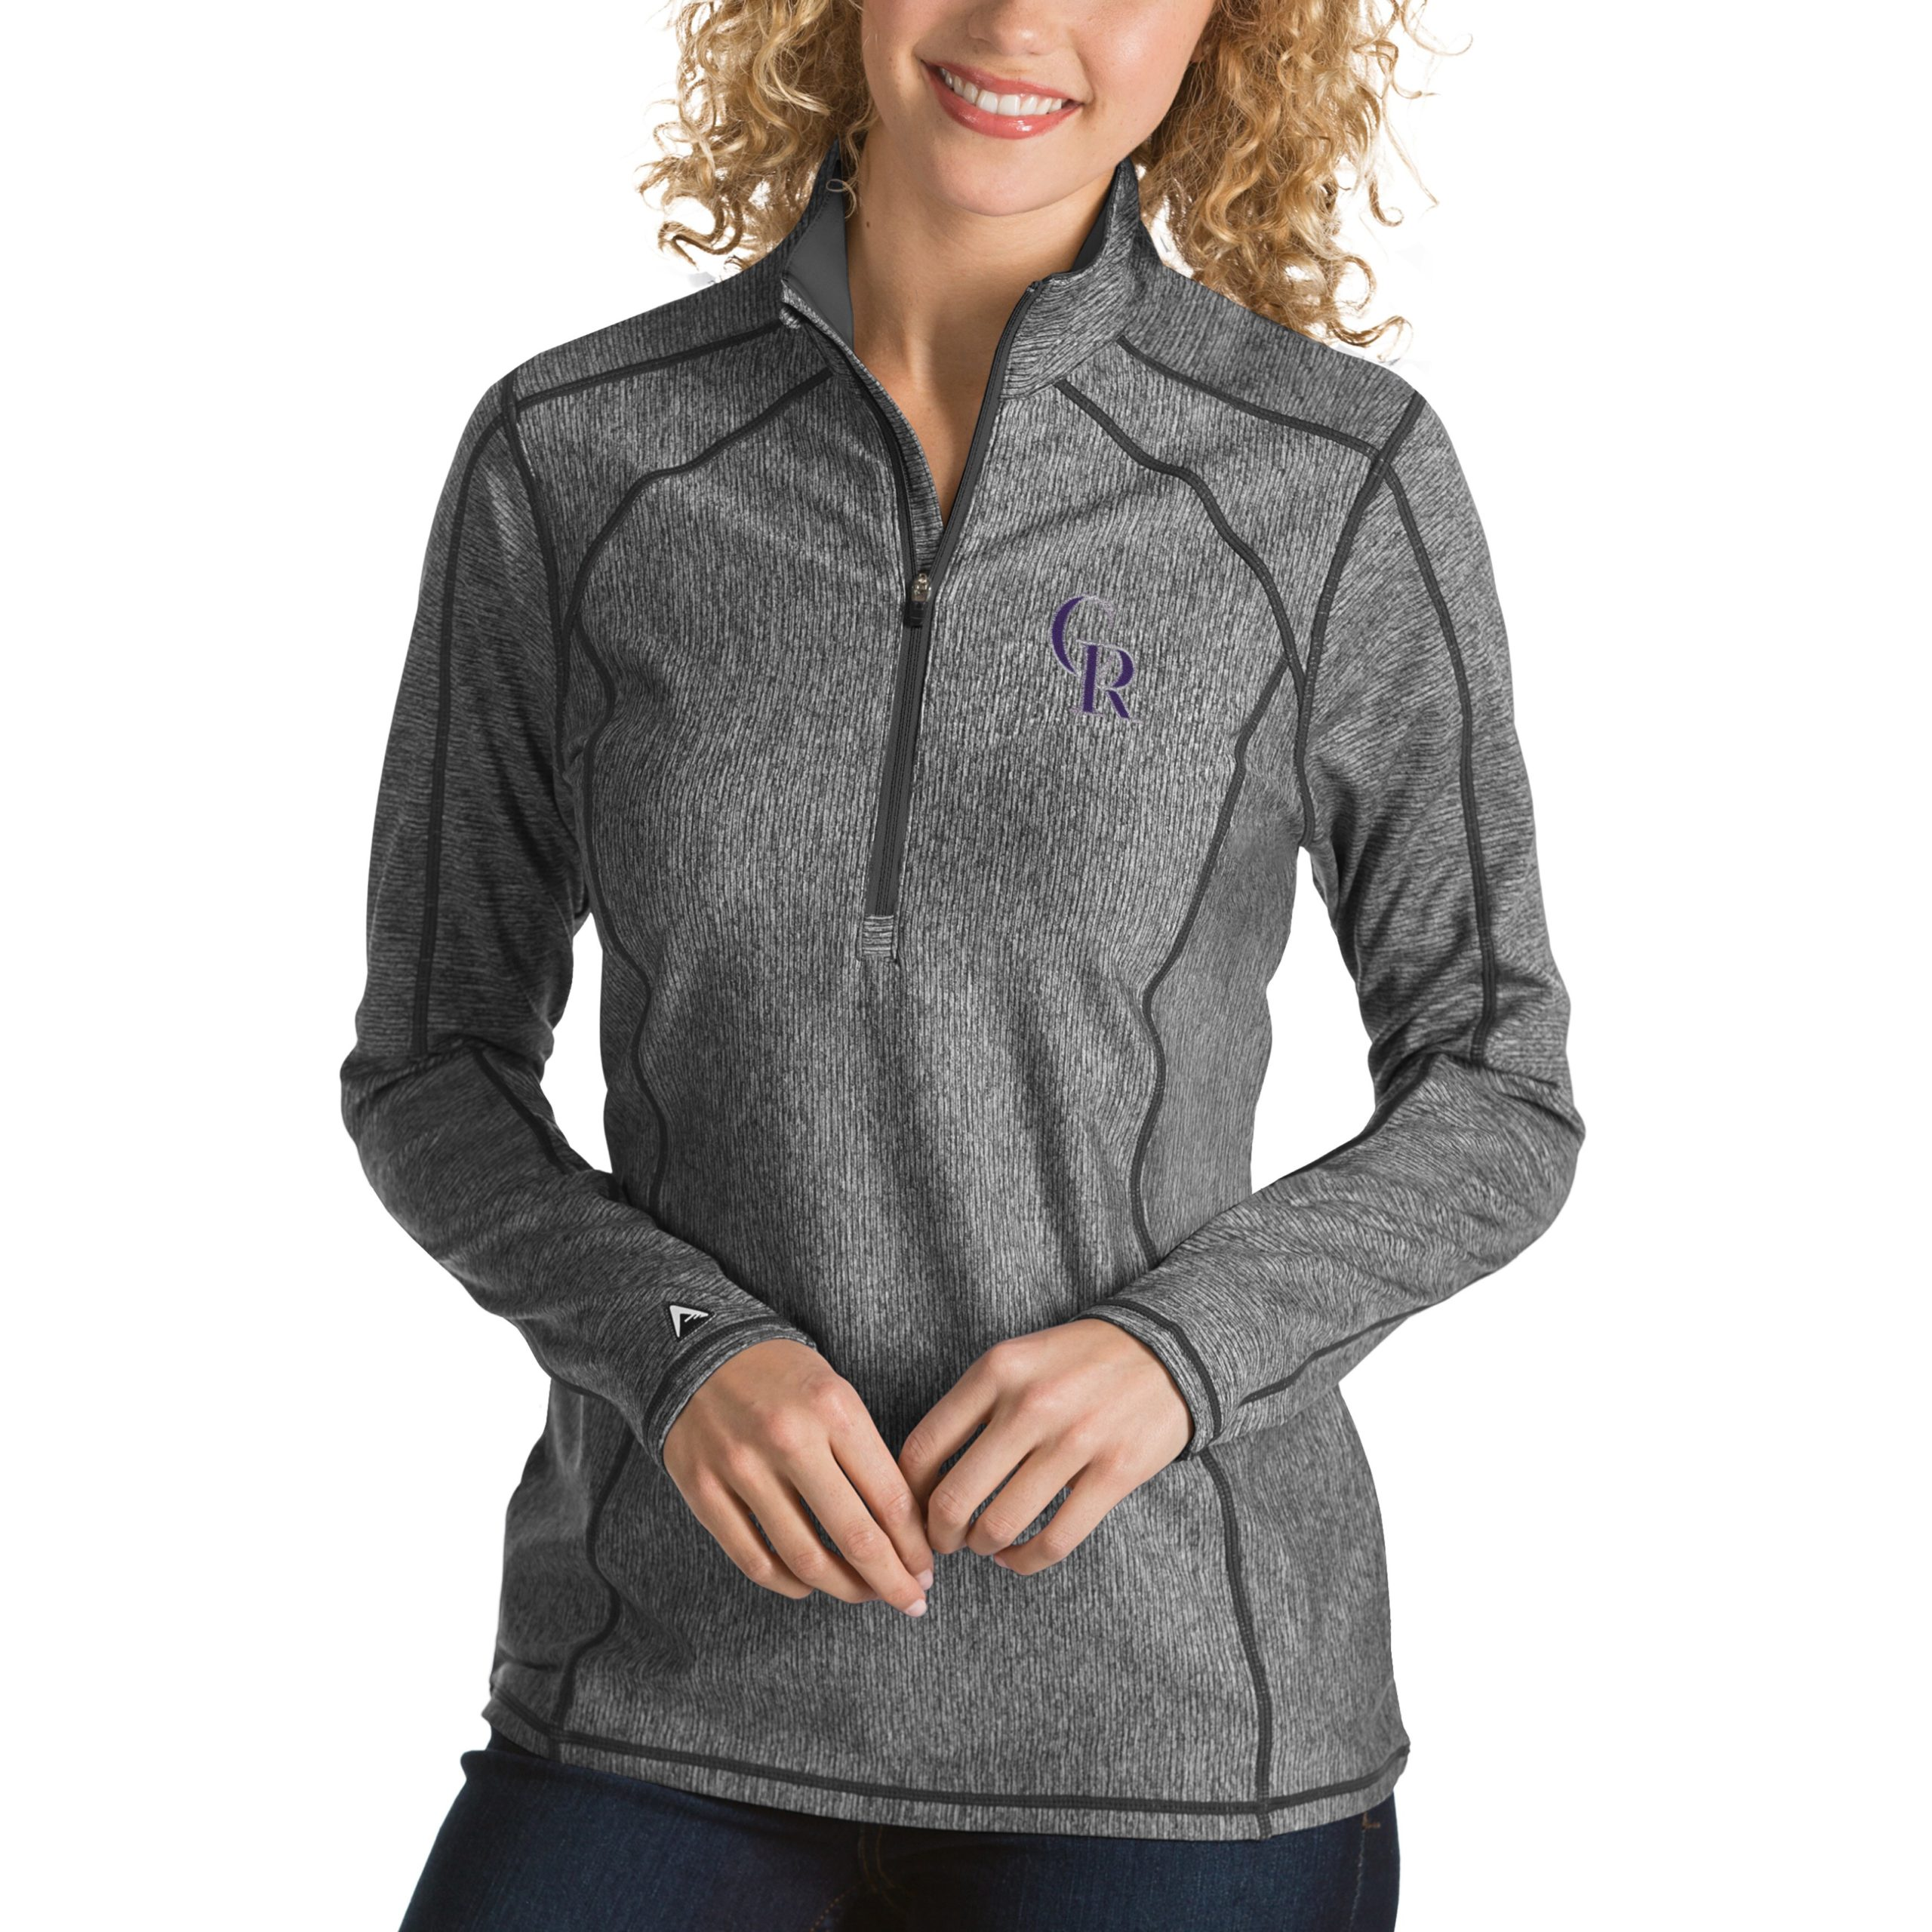 Colorado Rockies Antigua Women's Tempo Desert Dry 1/4-Zip Pullover Jacket - Heathered Charcoal